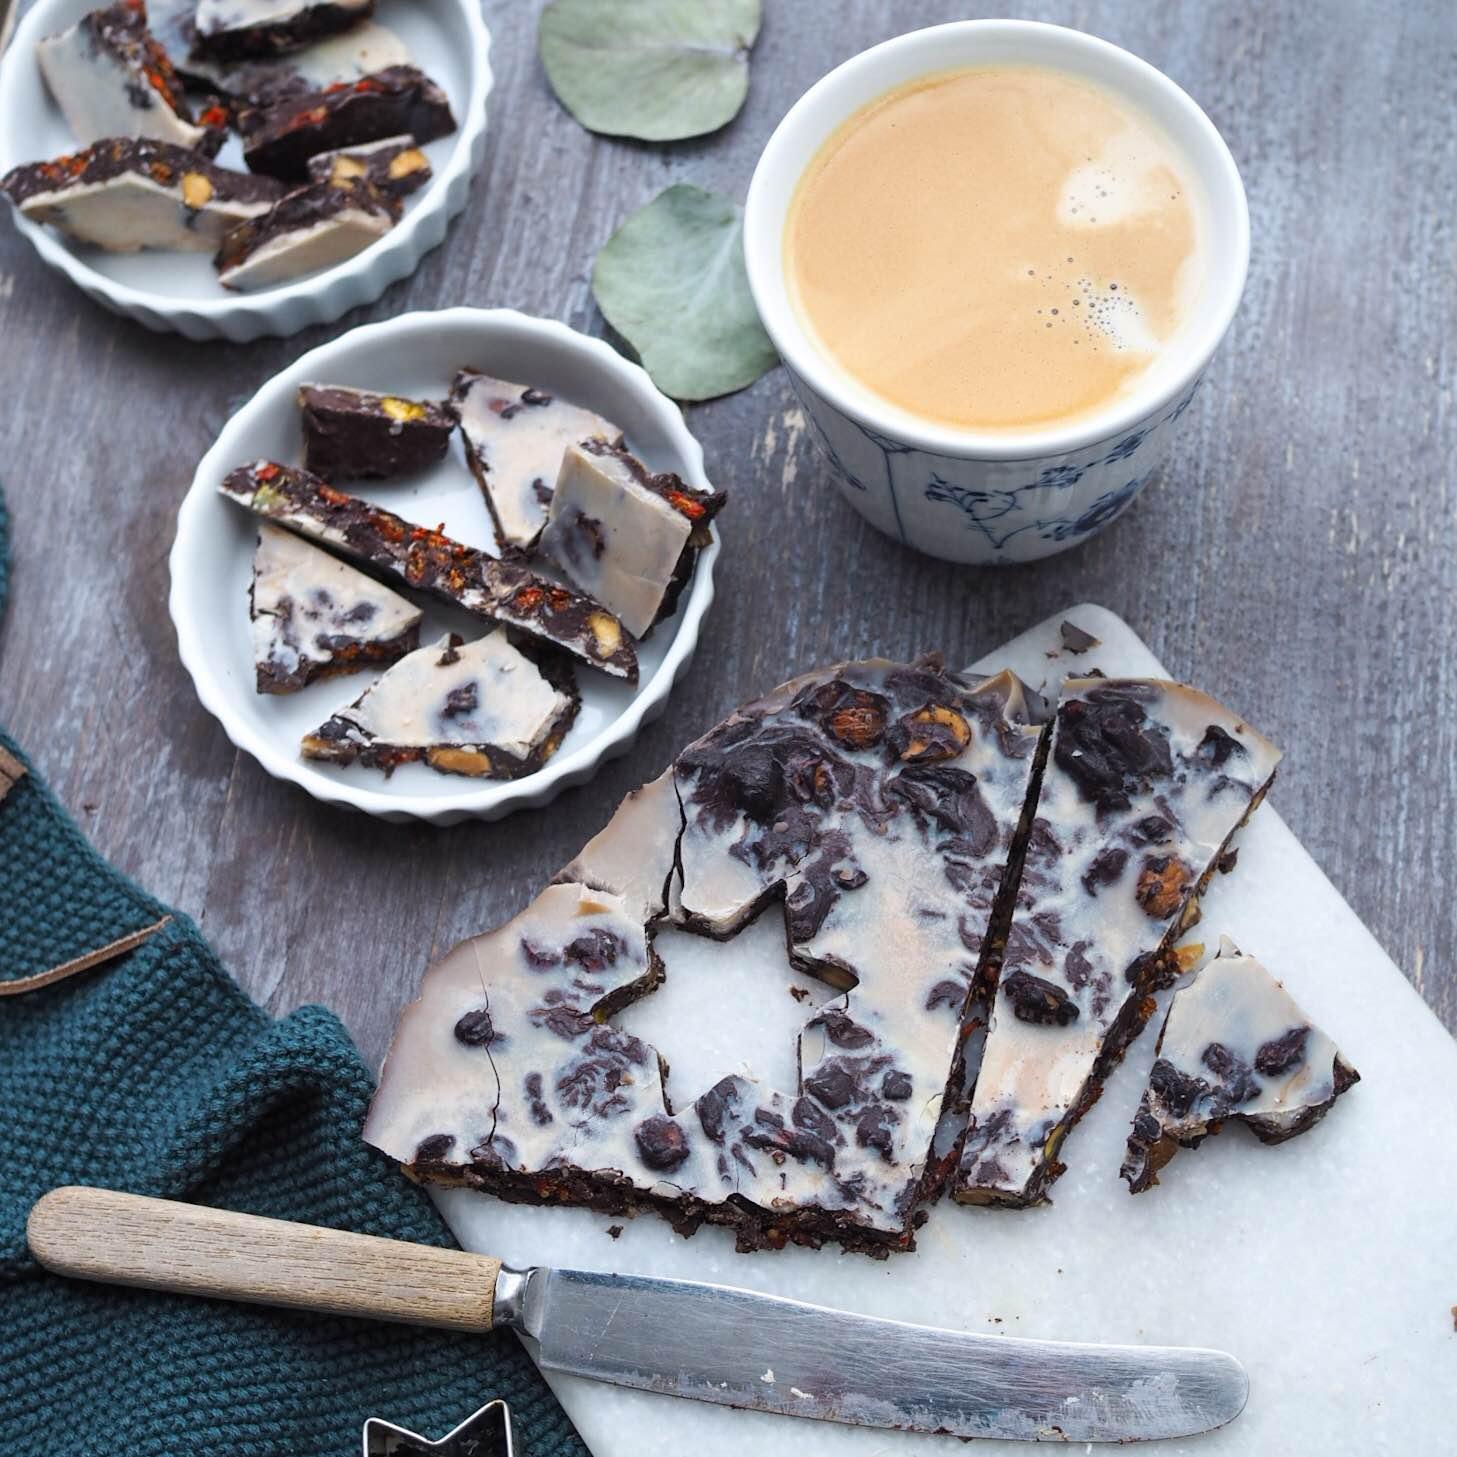 Hjemmelavet vegansk chokolade lavet på kokosmælk og serveret med en kaffe på havremælk